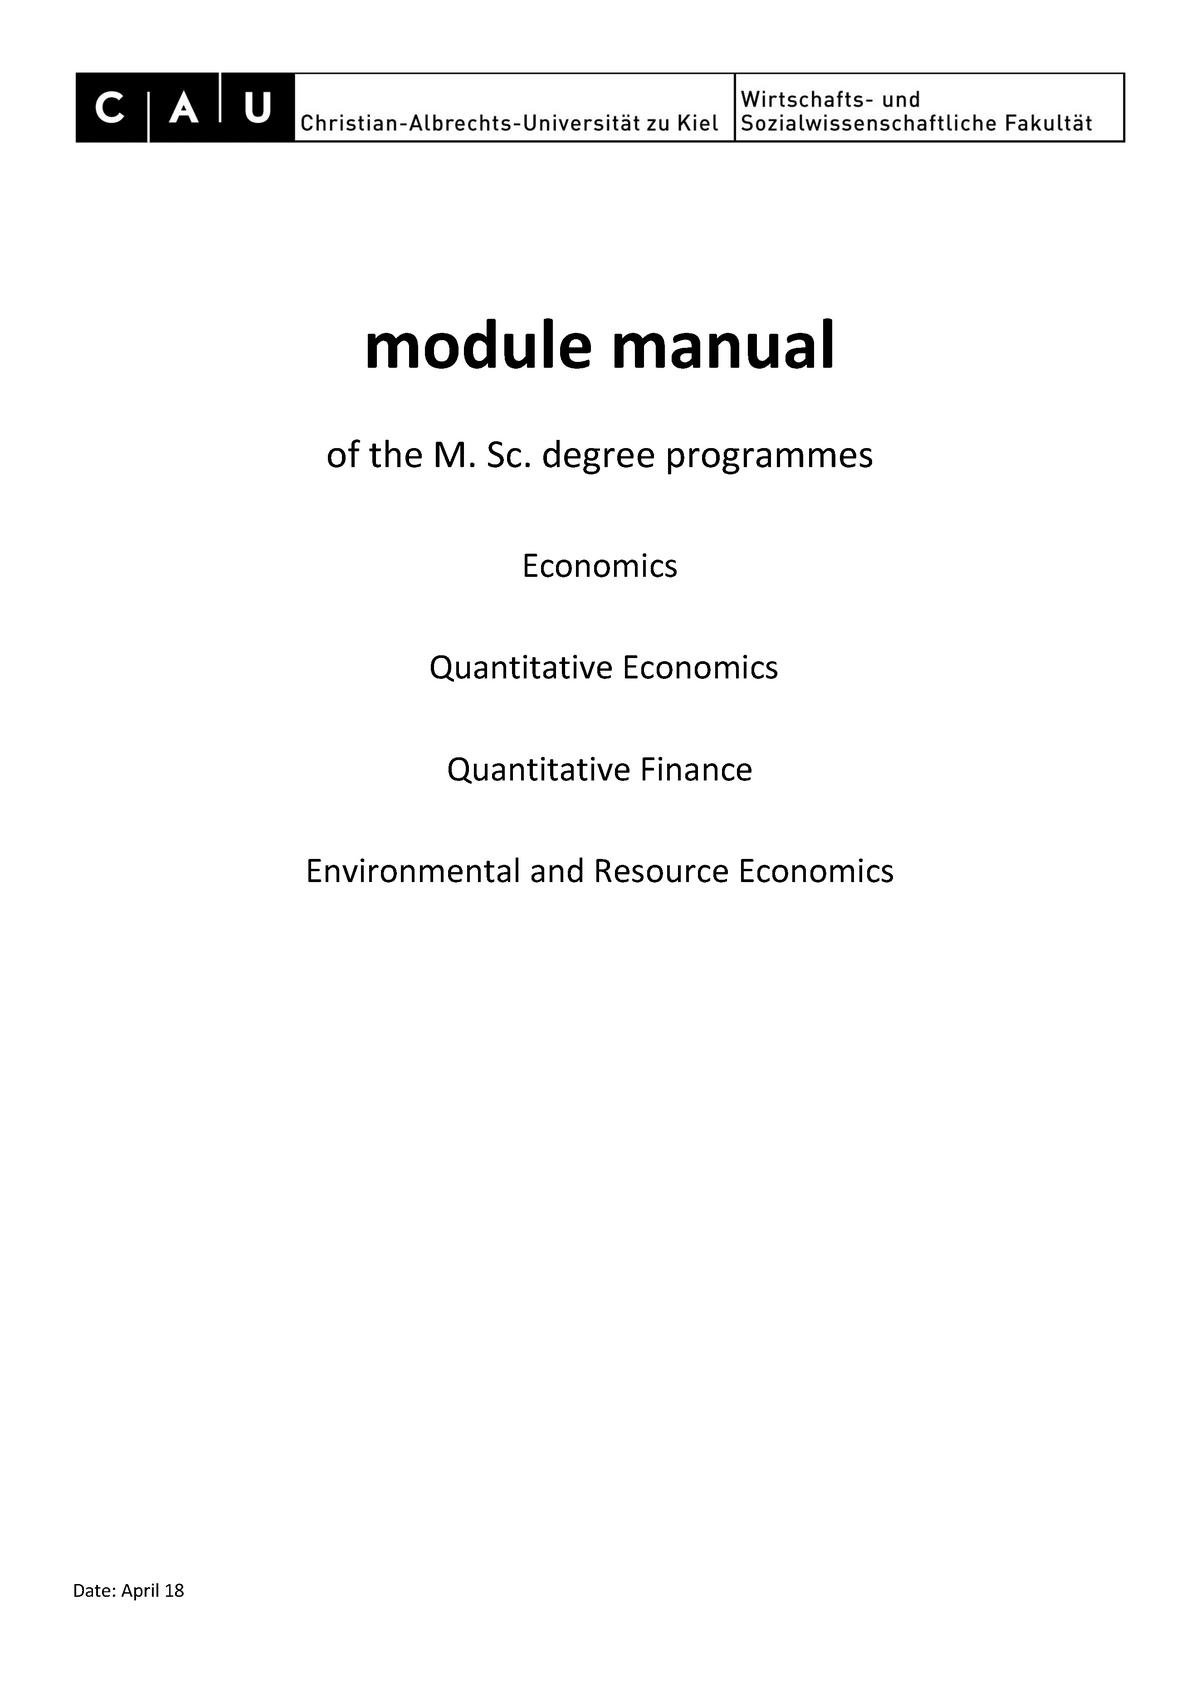 Module Manual Economics Master Programs - 011203: Engineering